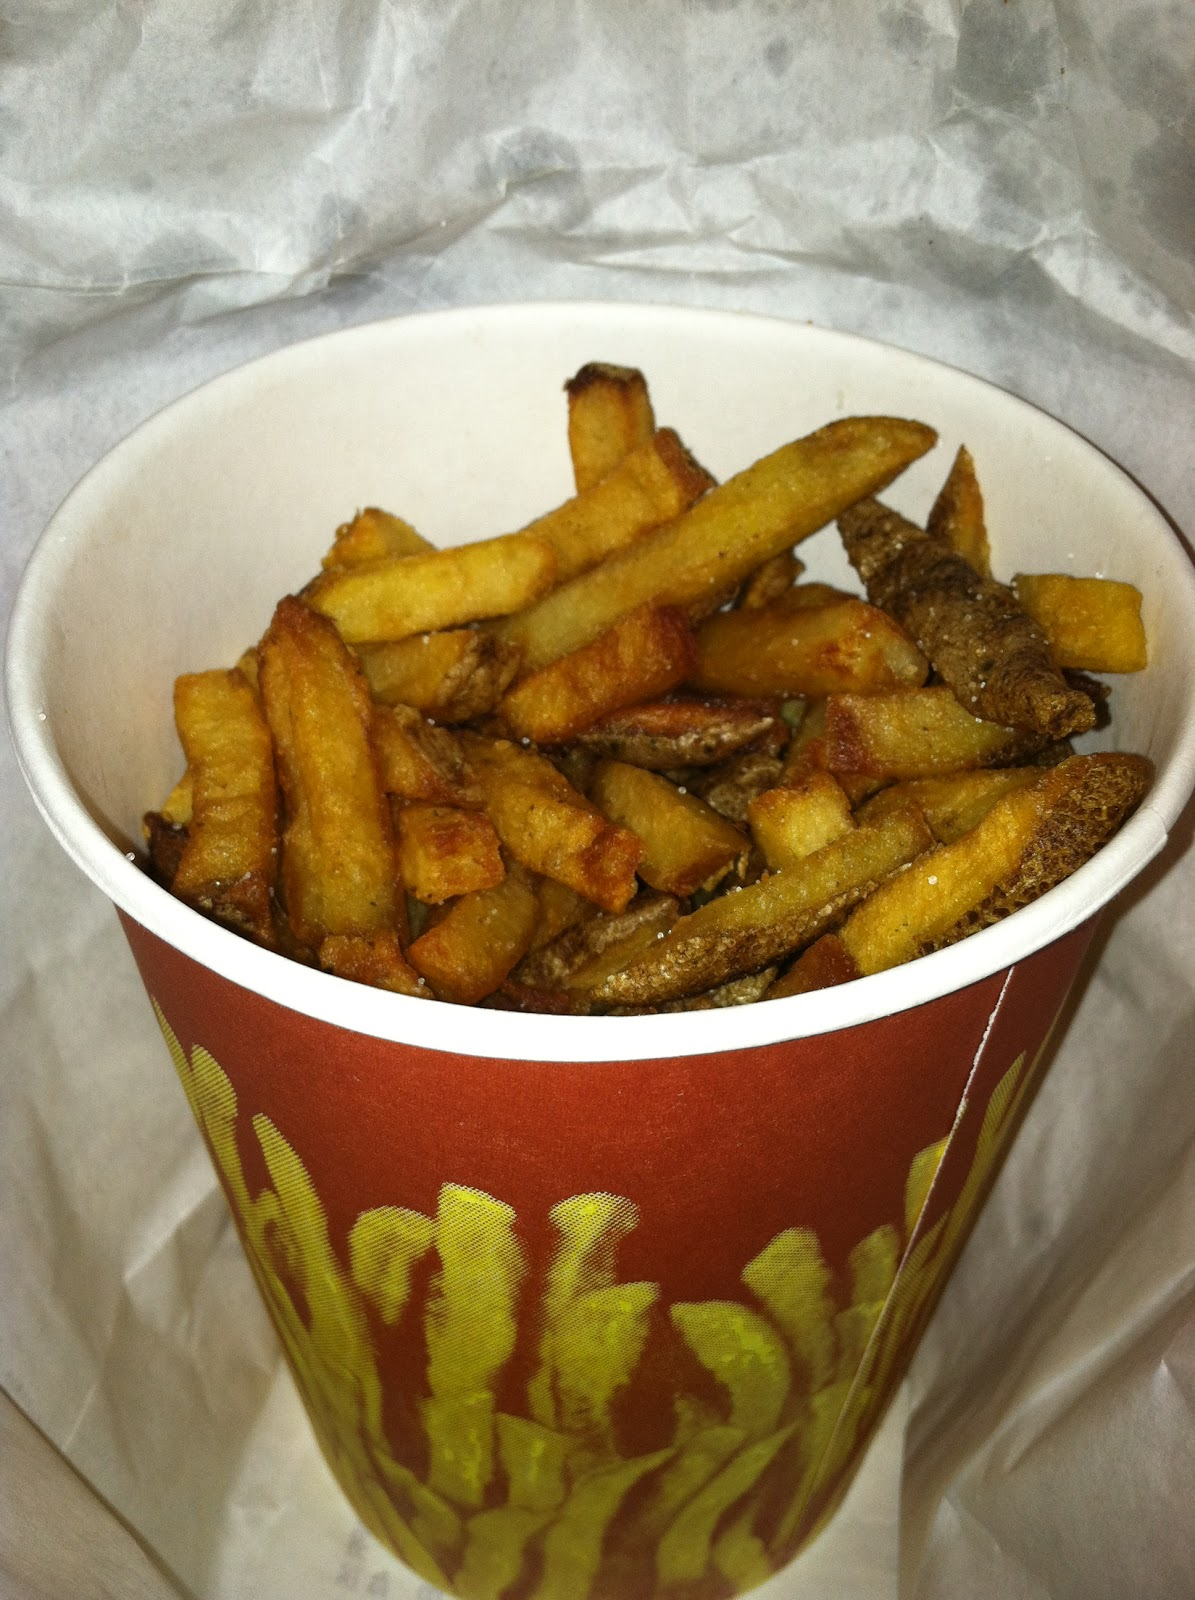 ... : French Fry Diary 310: Boardwalk Grill & Pizzeria, Cherry Hill NJ